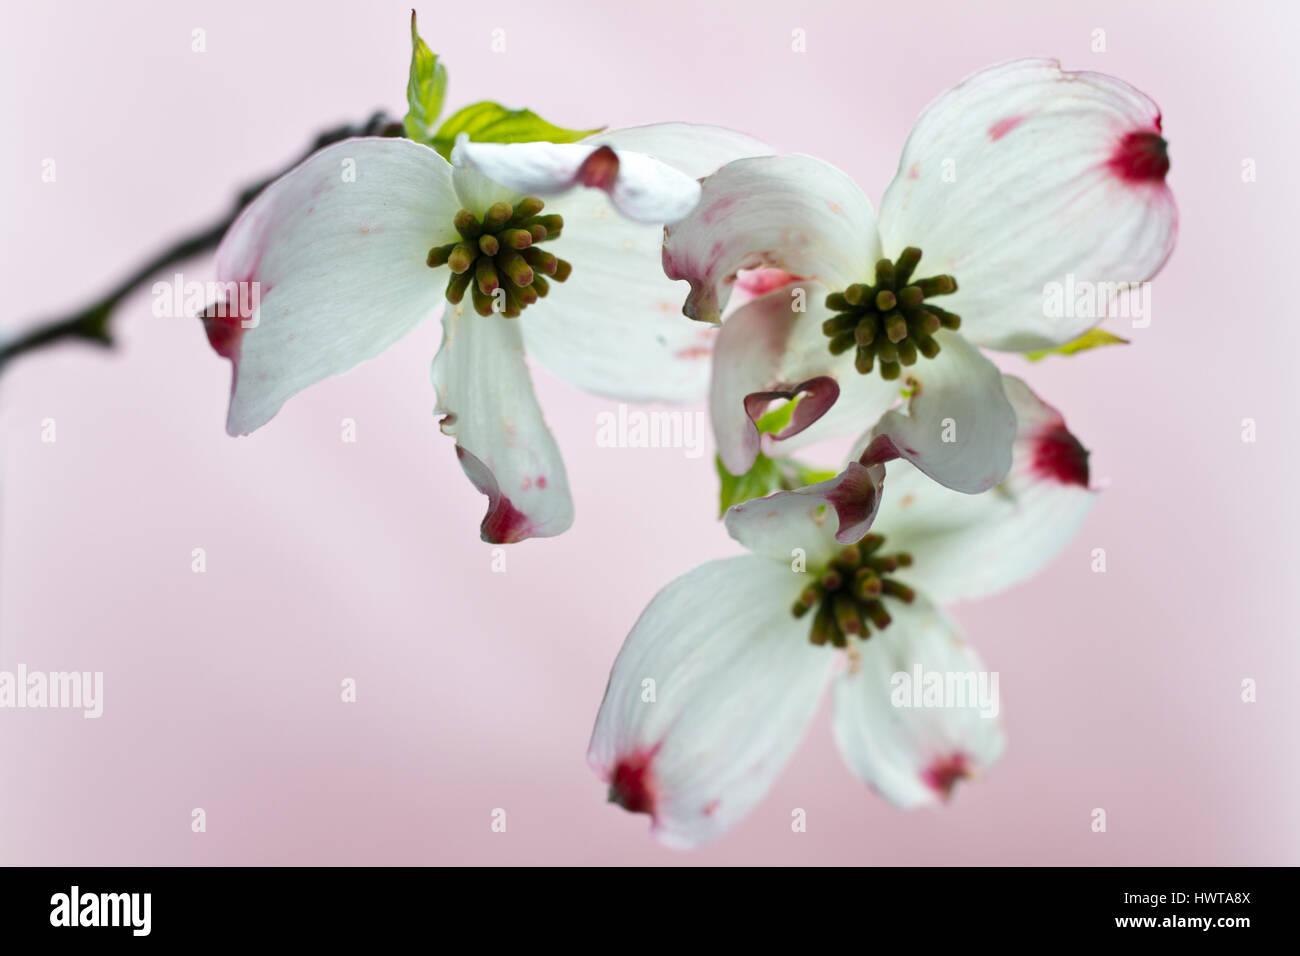 Blumenhartriegel - Stock Image